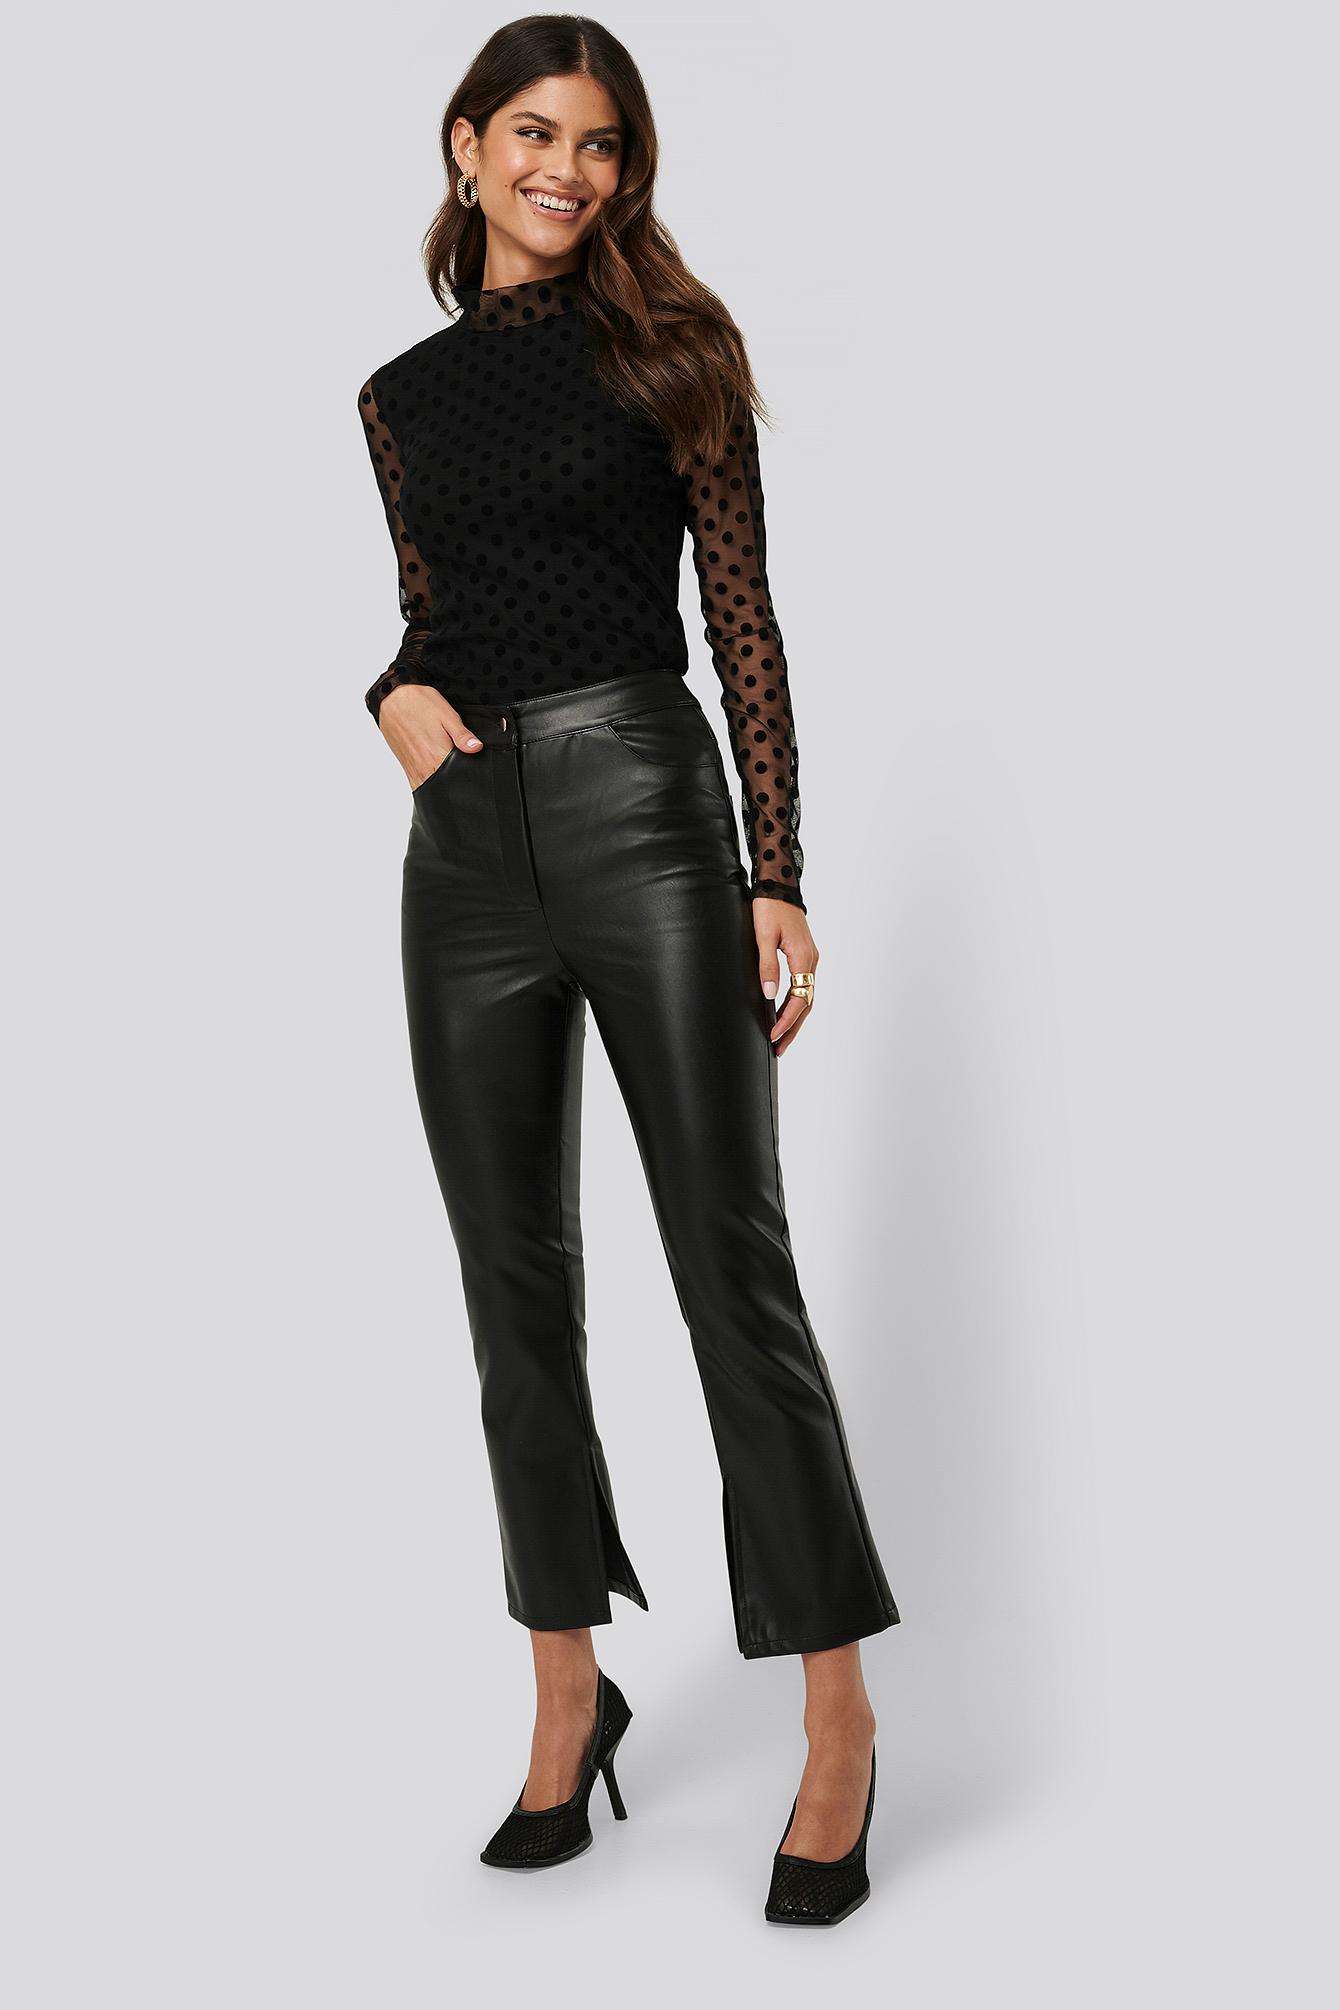 afj x na-kd -  Side Slit PU Pants - Black